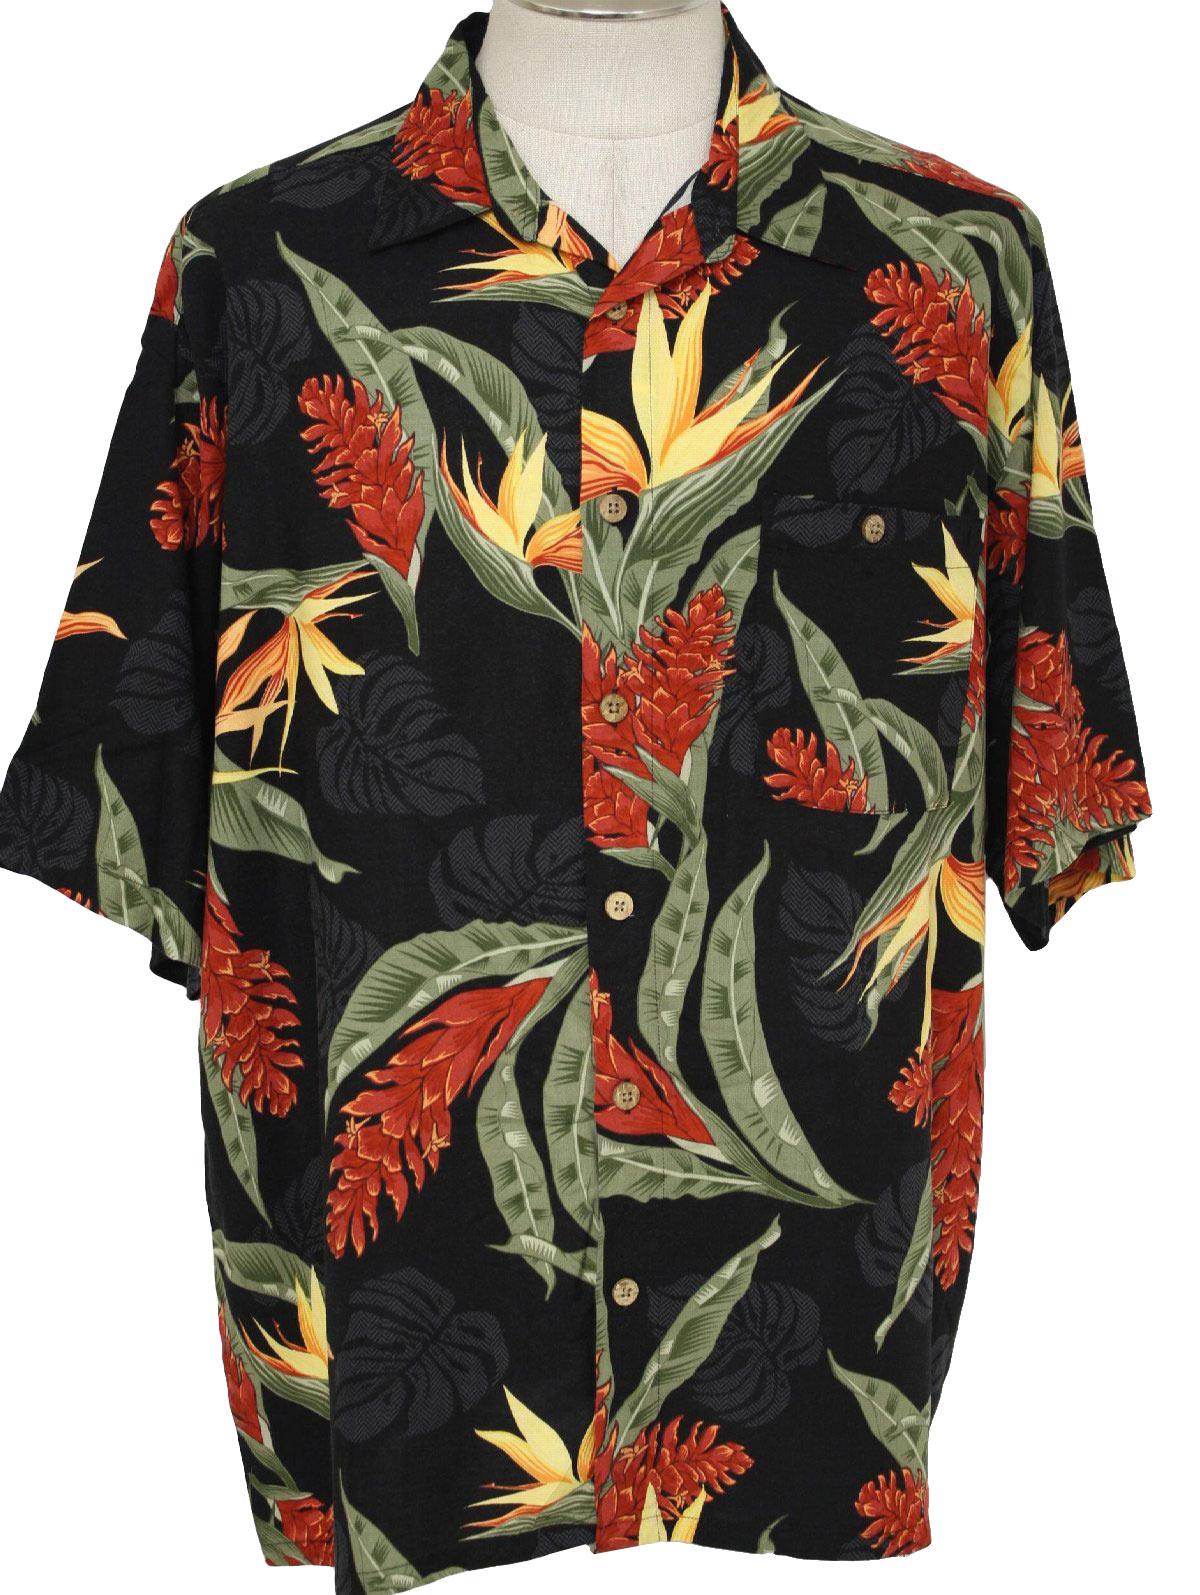 90s Vintage Puritan Hawaiian Shirt 90s Puritan Mens Black Yellow